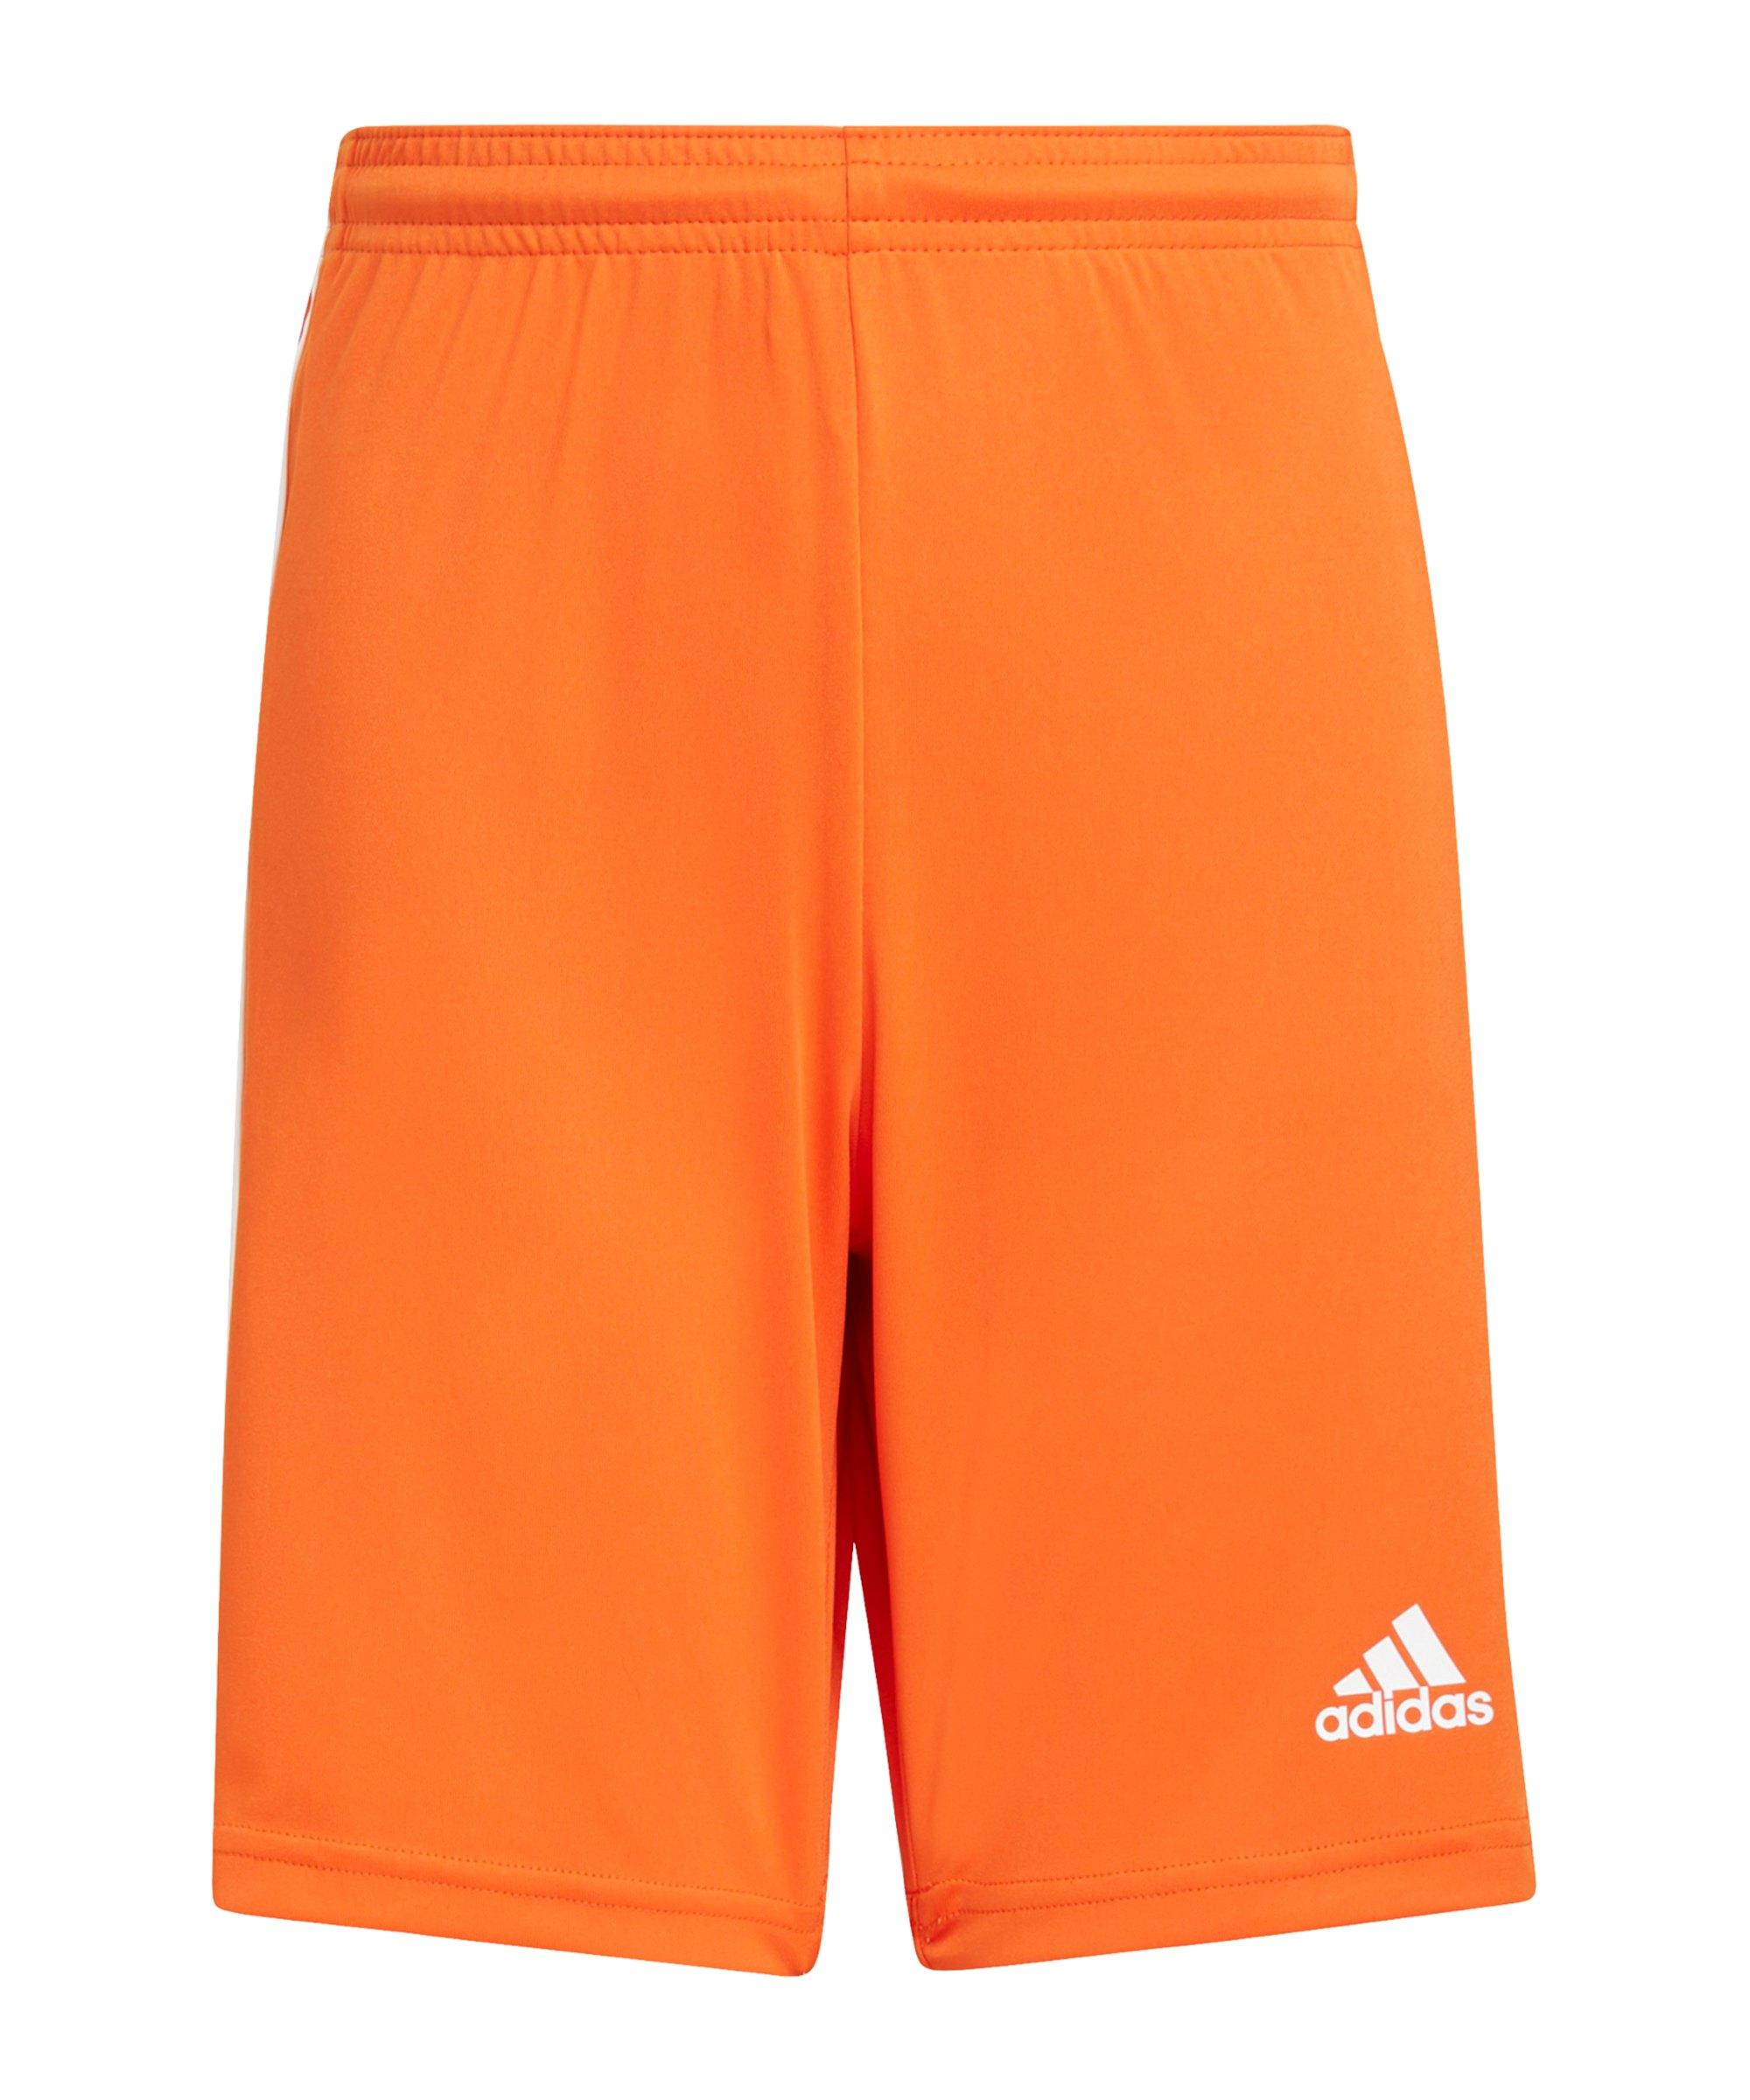 adidas Sqaud 21 Short Kids Orange - orange